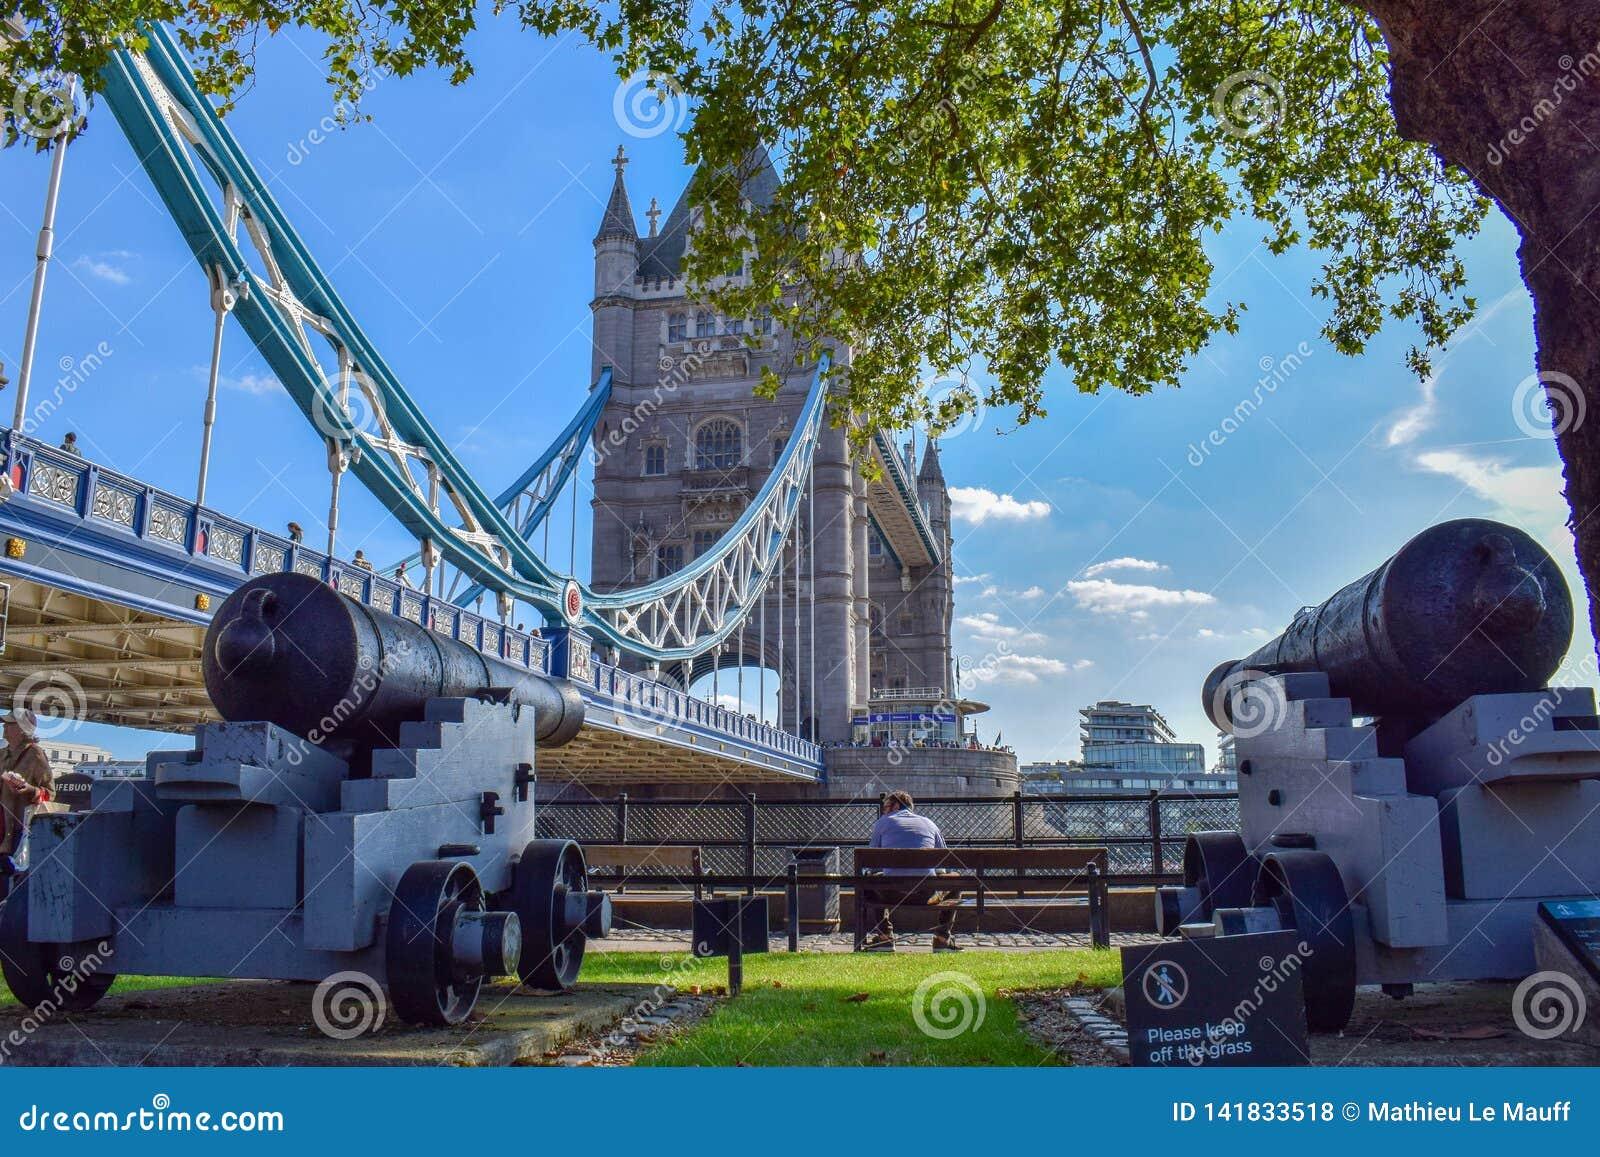 Turm-Brücken-Parkblick mit alten Kanonen